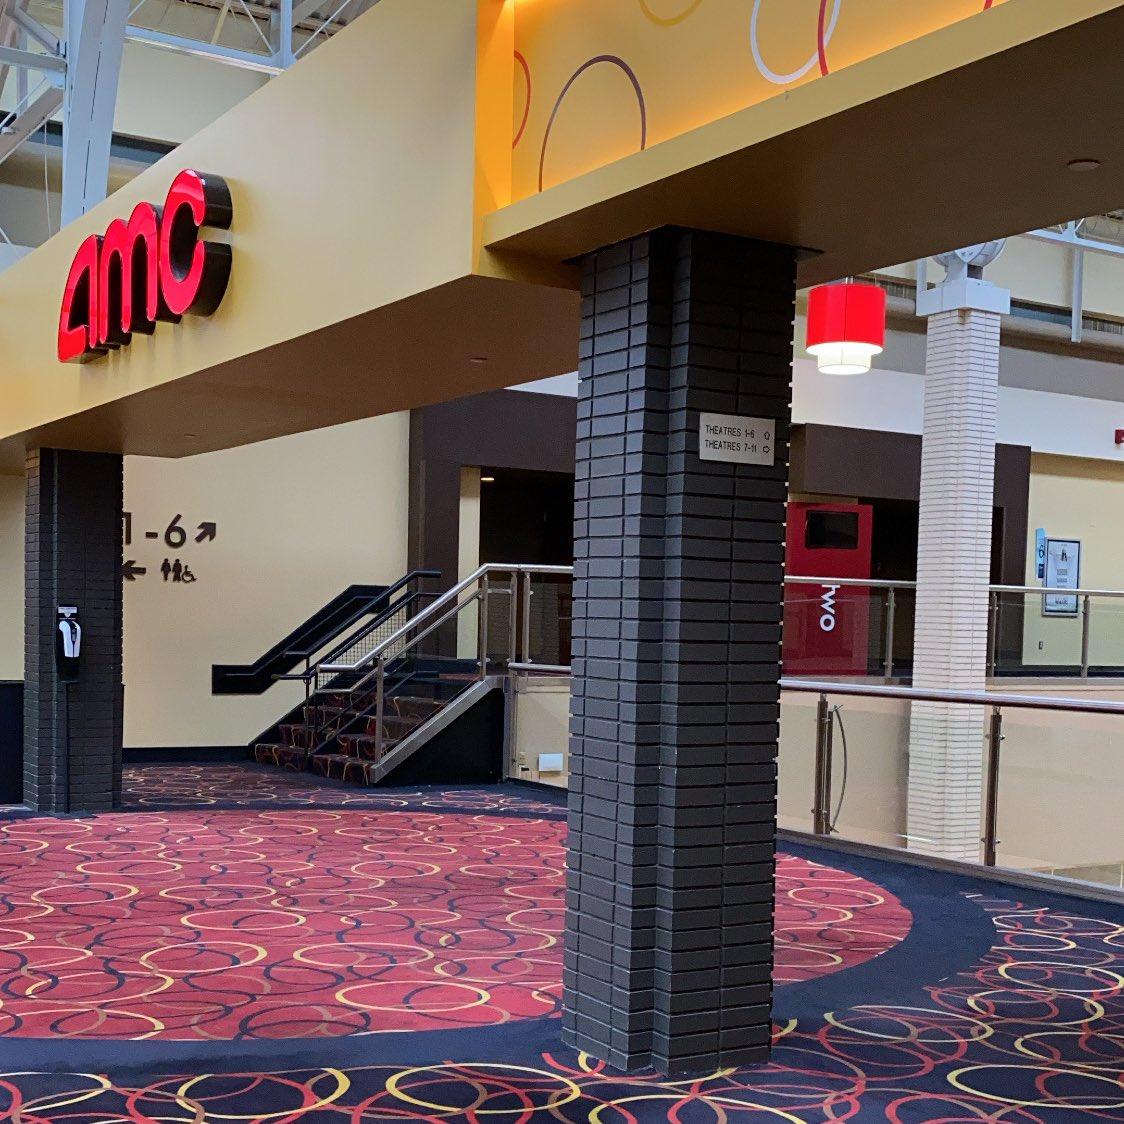 Movie time! #TGIF 🇺🇸 #LiamNeeson never disappoints! #TheMarksman @AMCTheatres @TheMarksmanMov